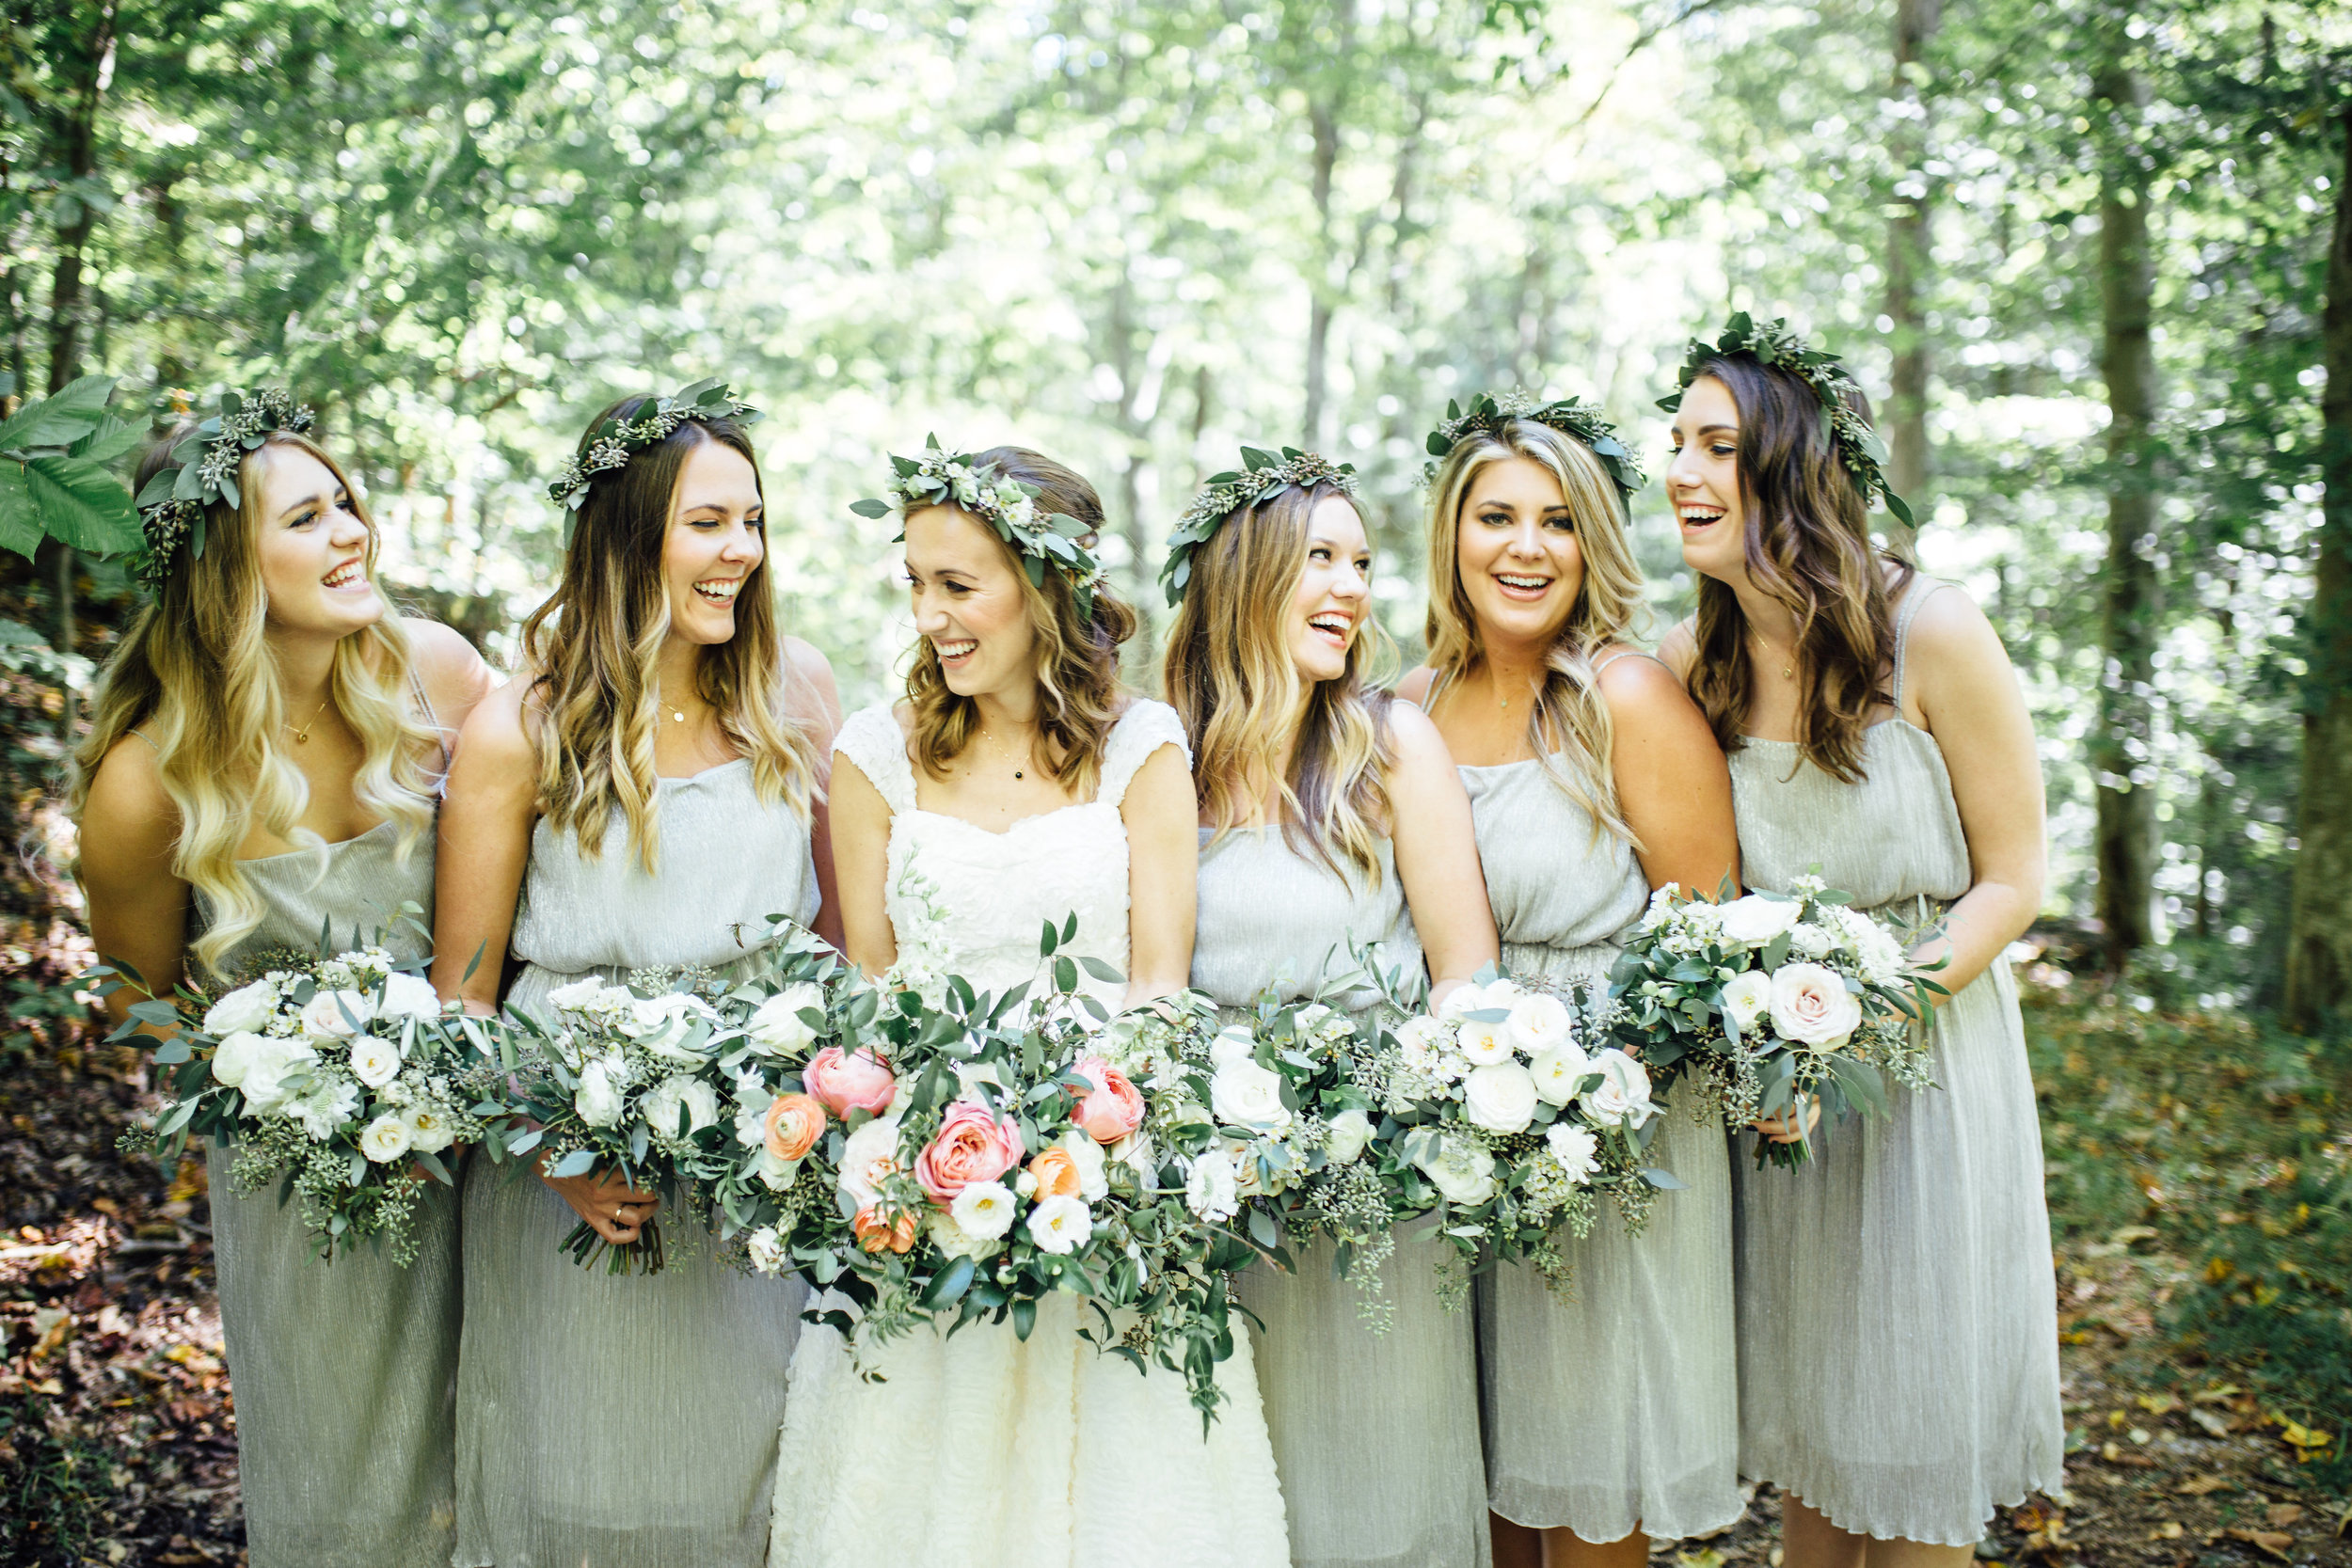 Joyful bride and bridesmaids // Southern Wedding Florist